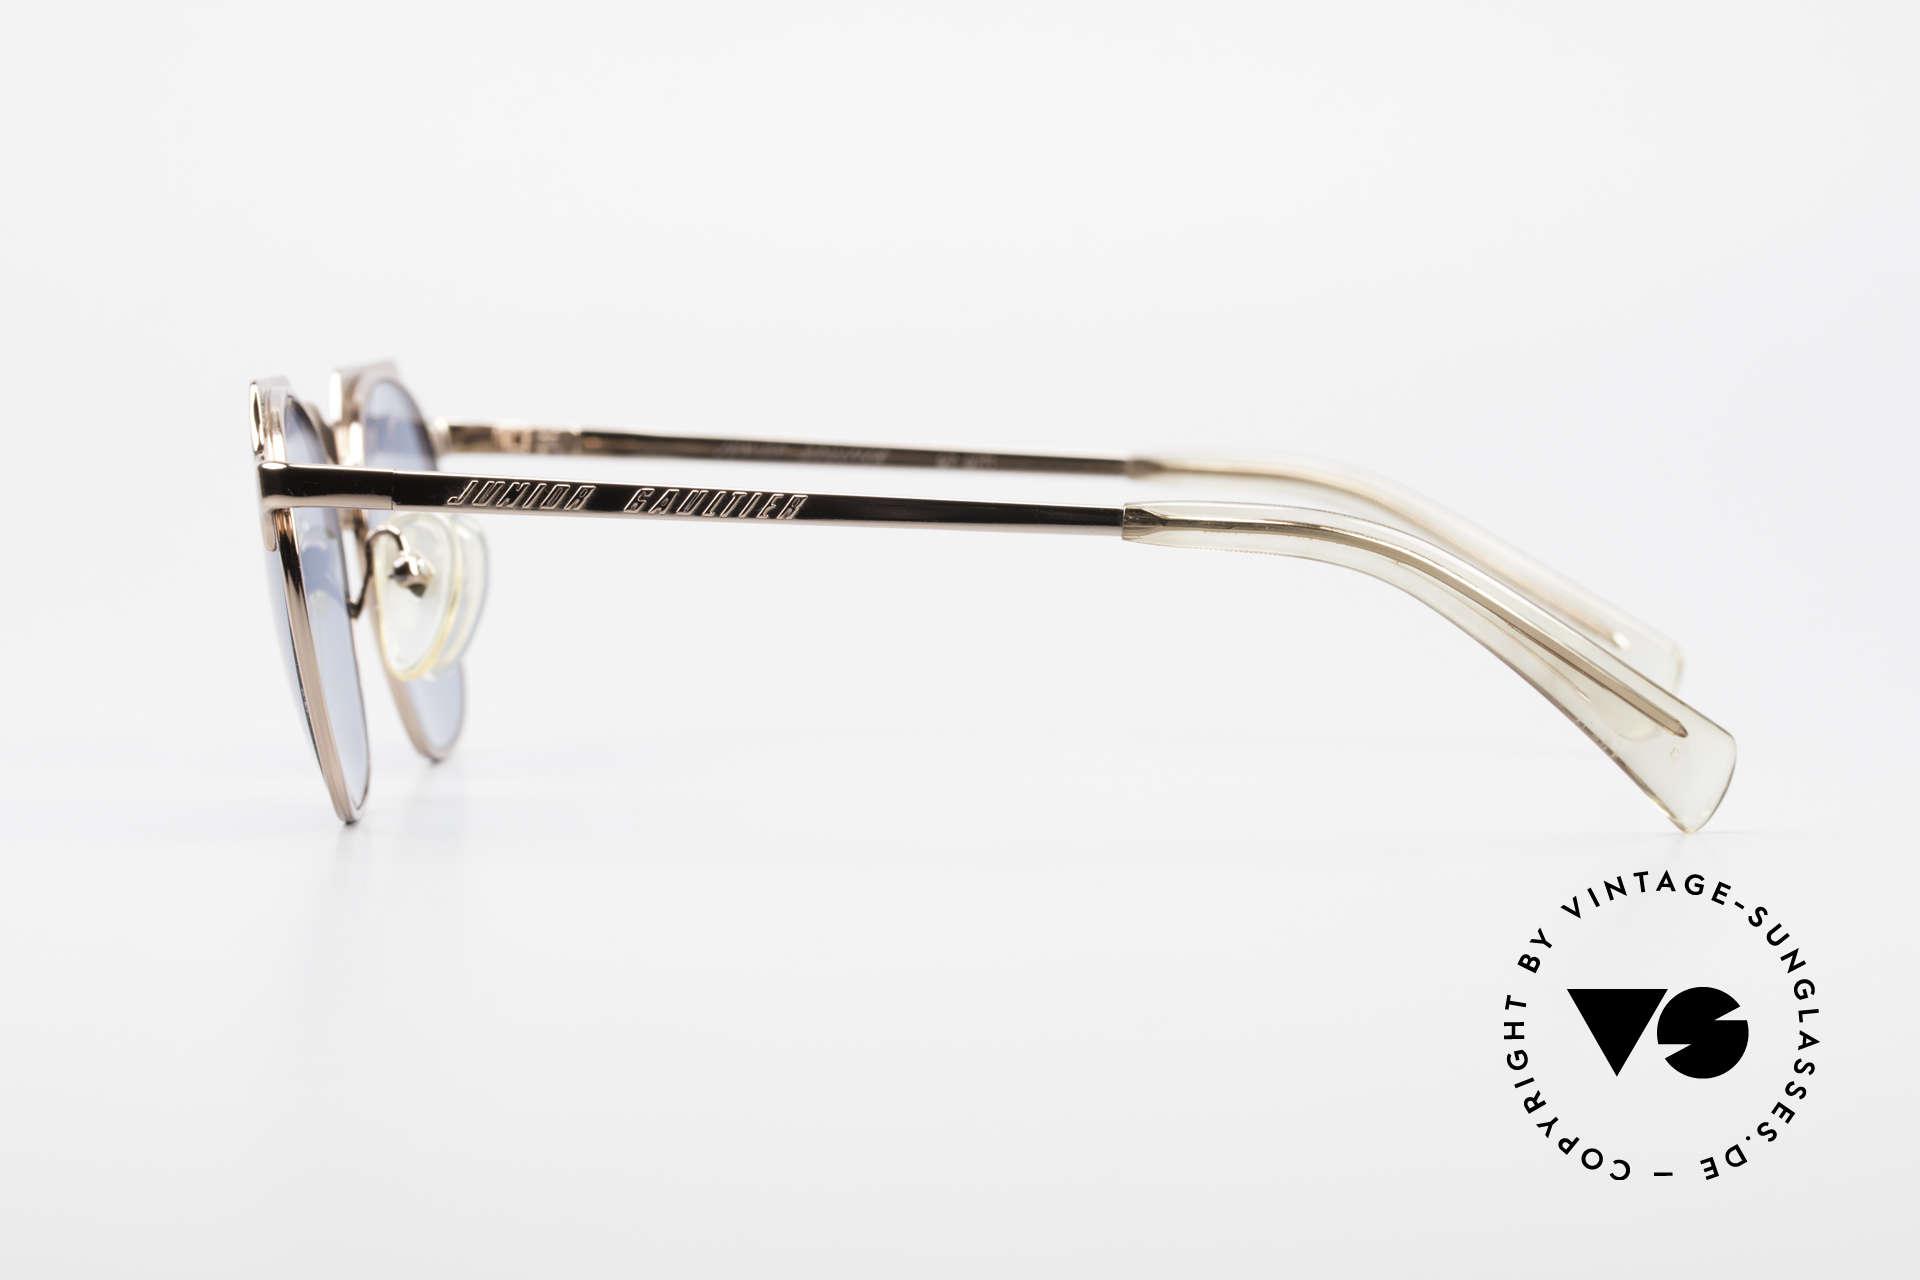 Jean Paul Gaultier 57-0171 Panto Designer Sunglasses, high-class & fancy frame finish in bronze-metallic, Made for Men and Women